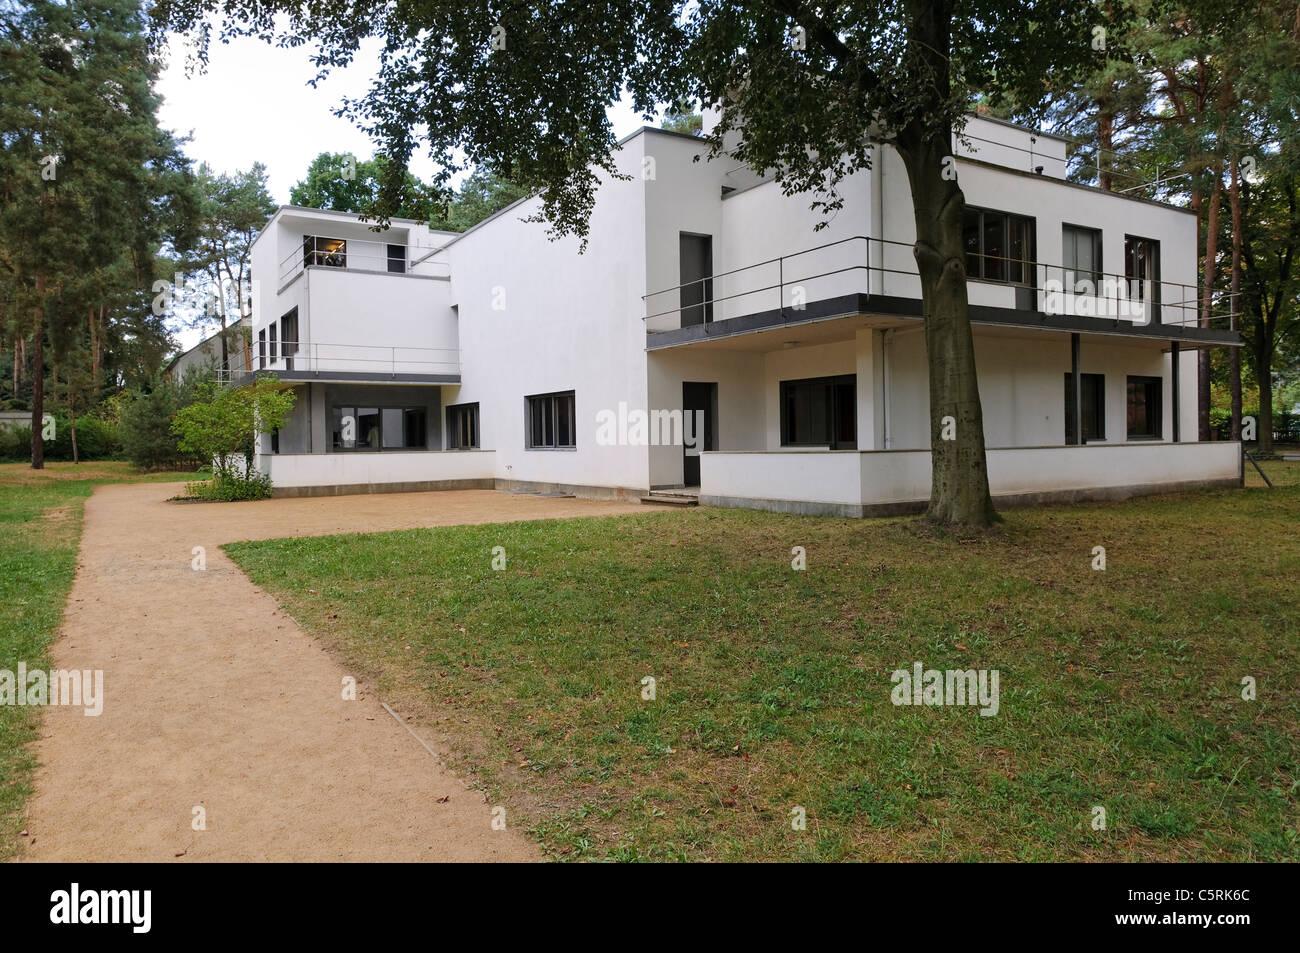 Haus Kandinsky Haus Klee House Bauhaus